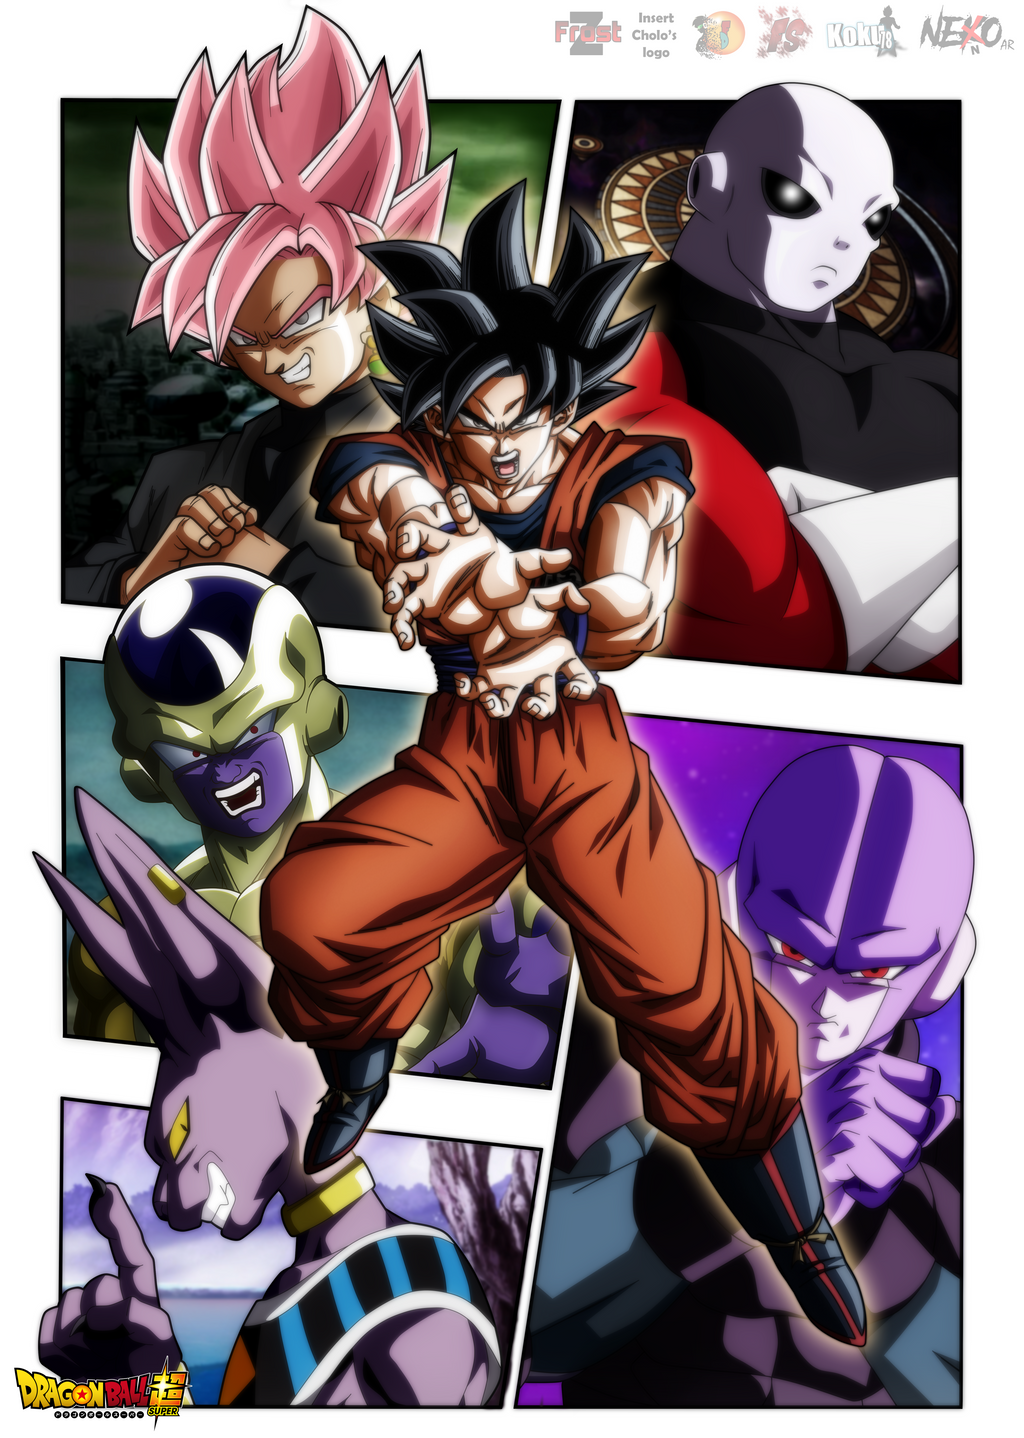 Wallpaper Dragon Ball Super Colab|FacuDibuja